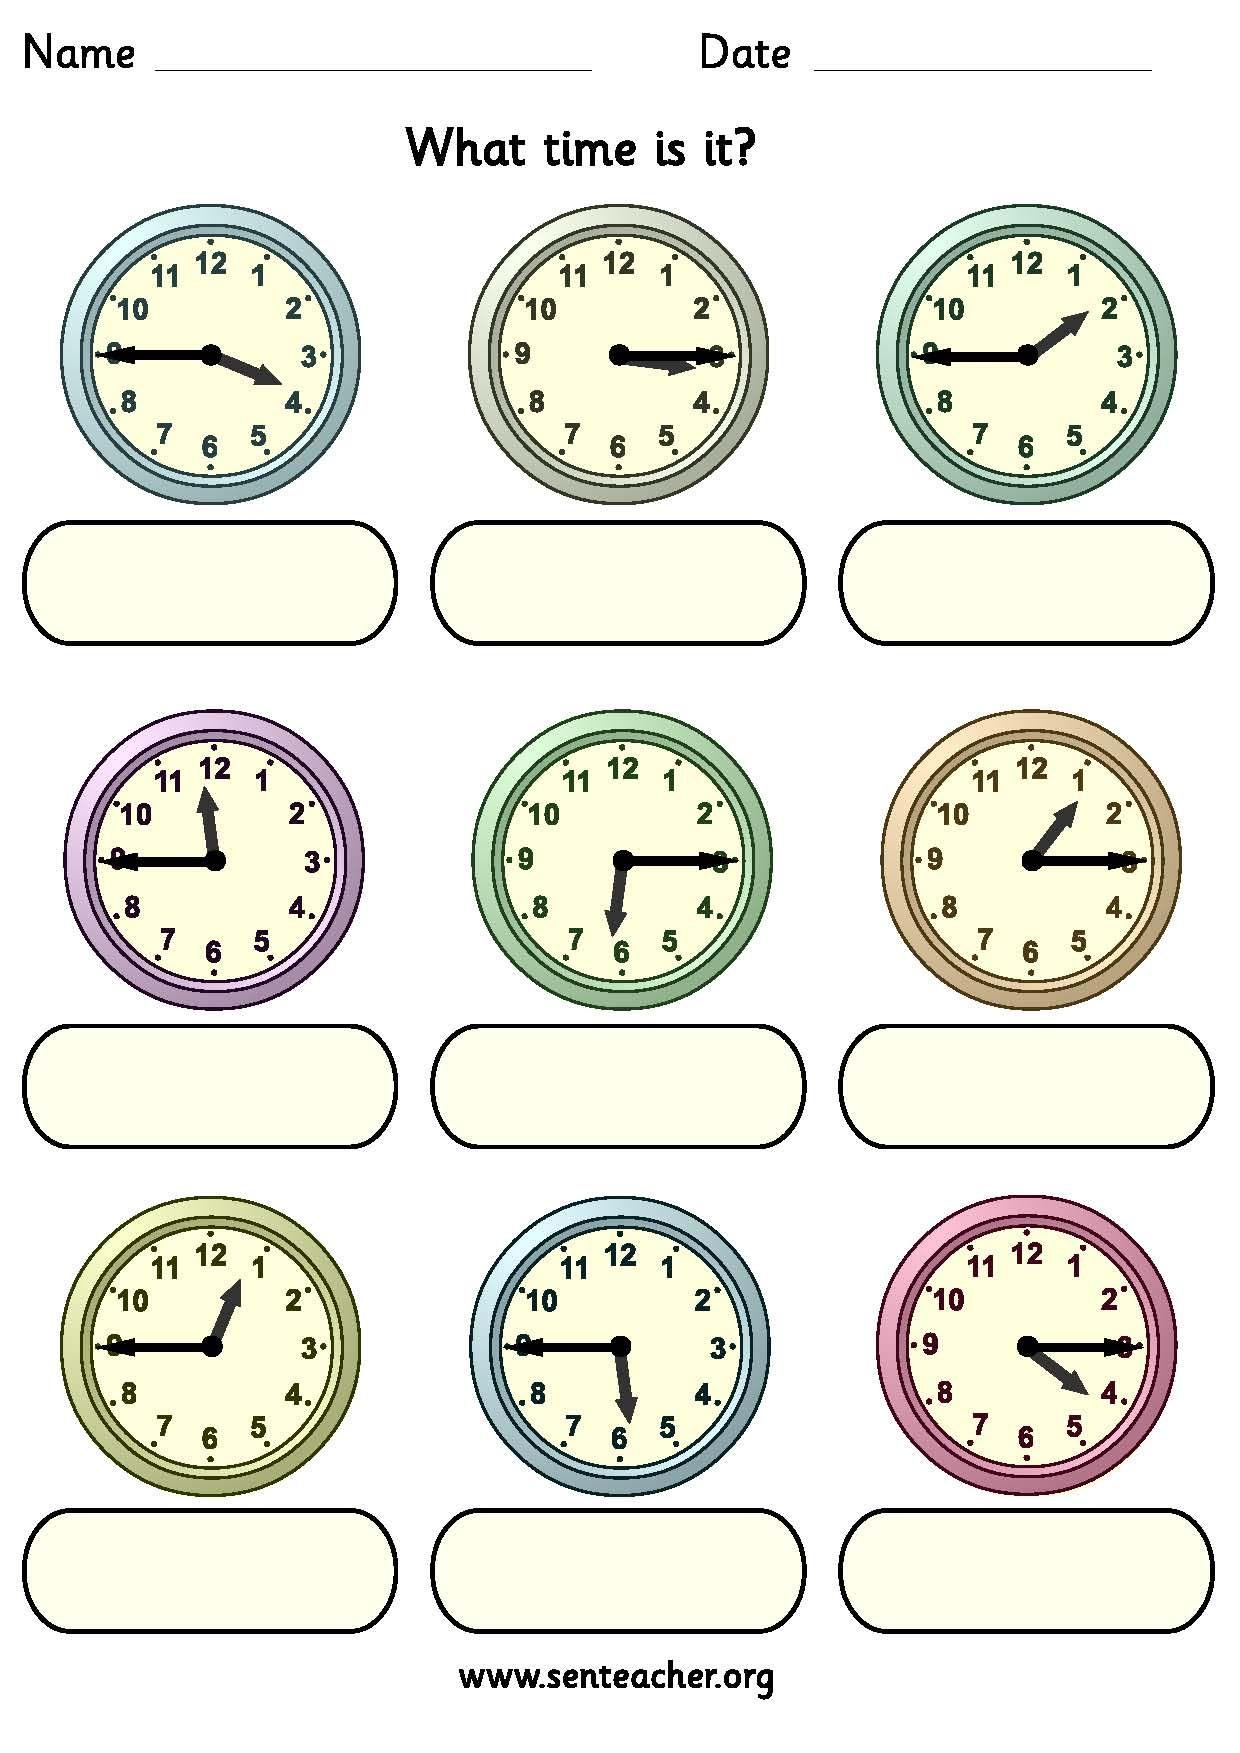 Worksheet Containing 9ogue Clocks Showing Quarter To